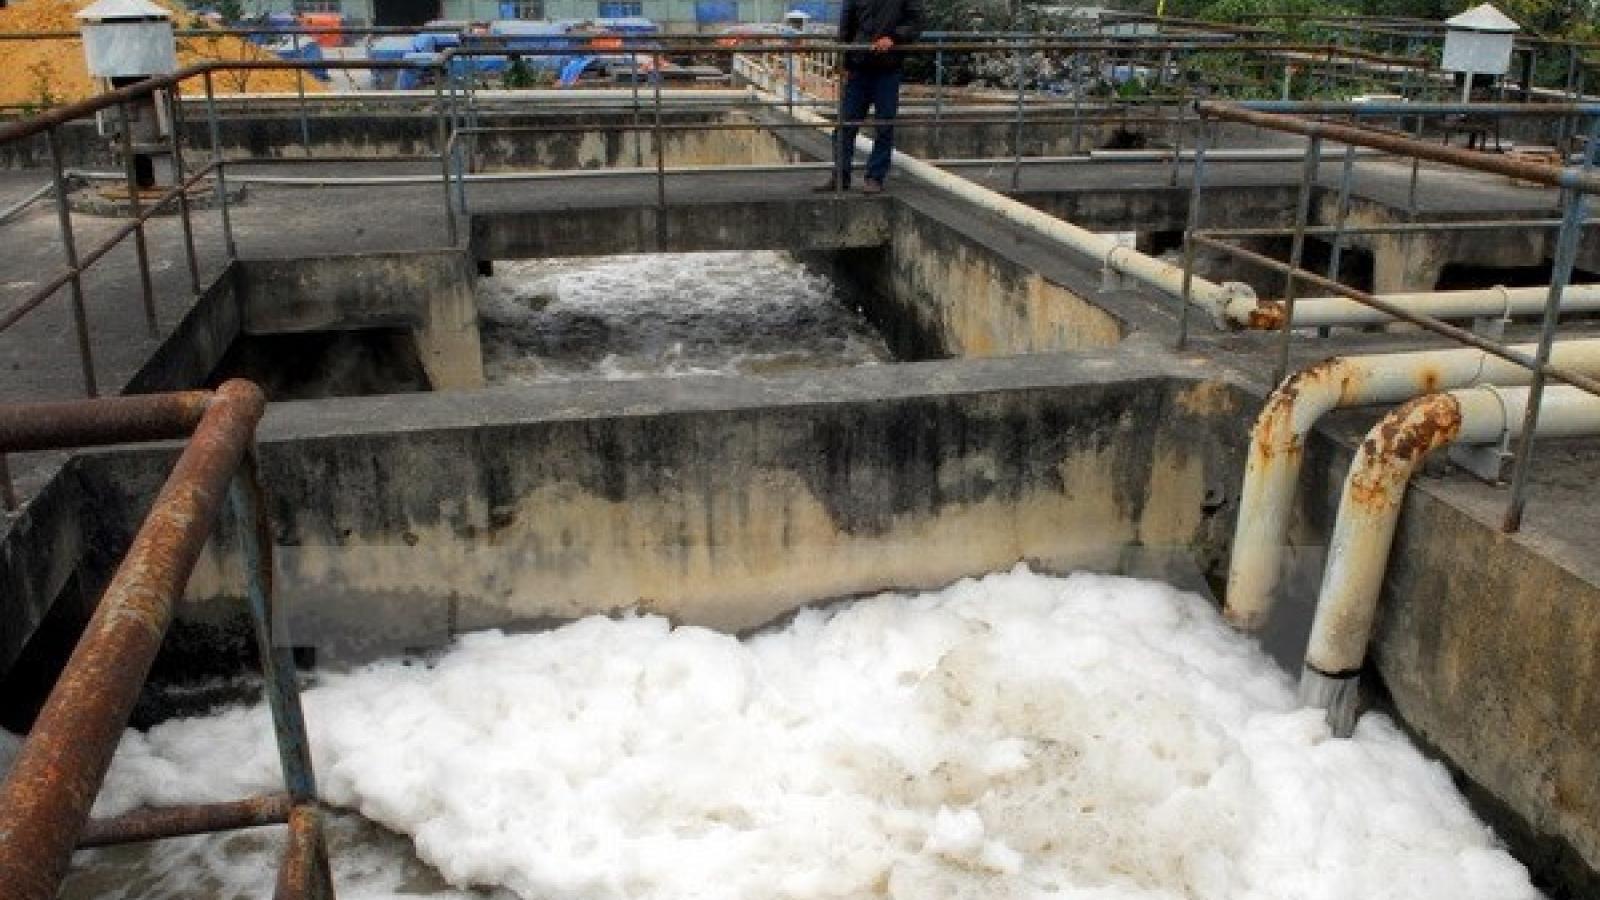 Vietnam, RoK eye cooperation in water treatment, environment